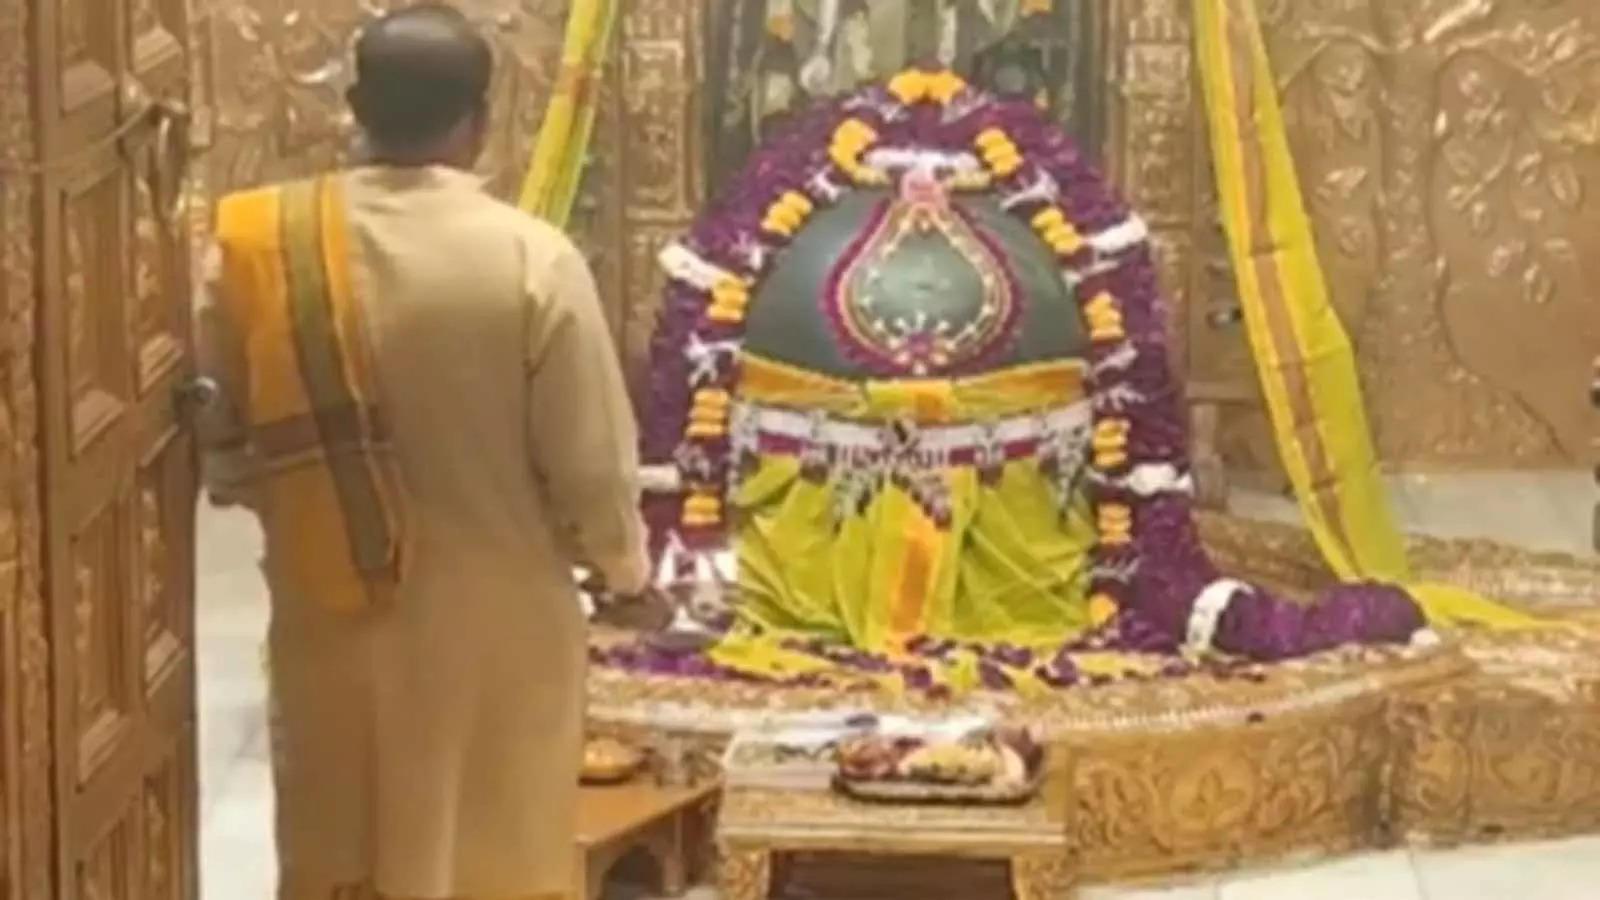 darshan-at-shree-somnath-temple-first-jyotirlinga-25-september-2021